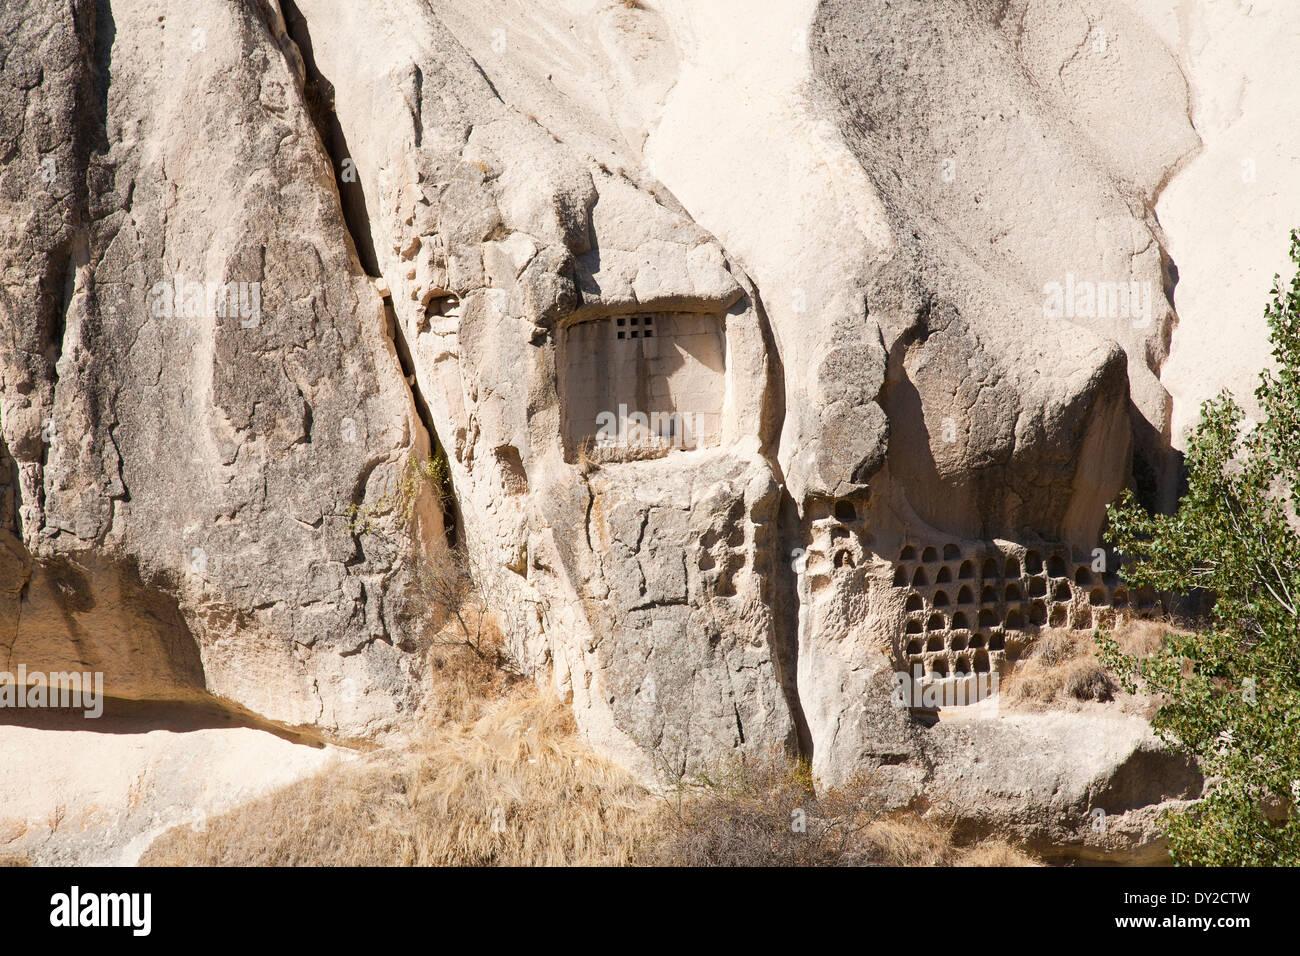 pigeon houses, pigeon valley, landscape, cappadocia, anatolia, turkey, asia - Stock Image